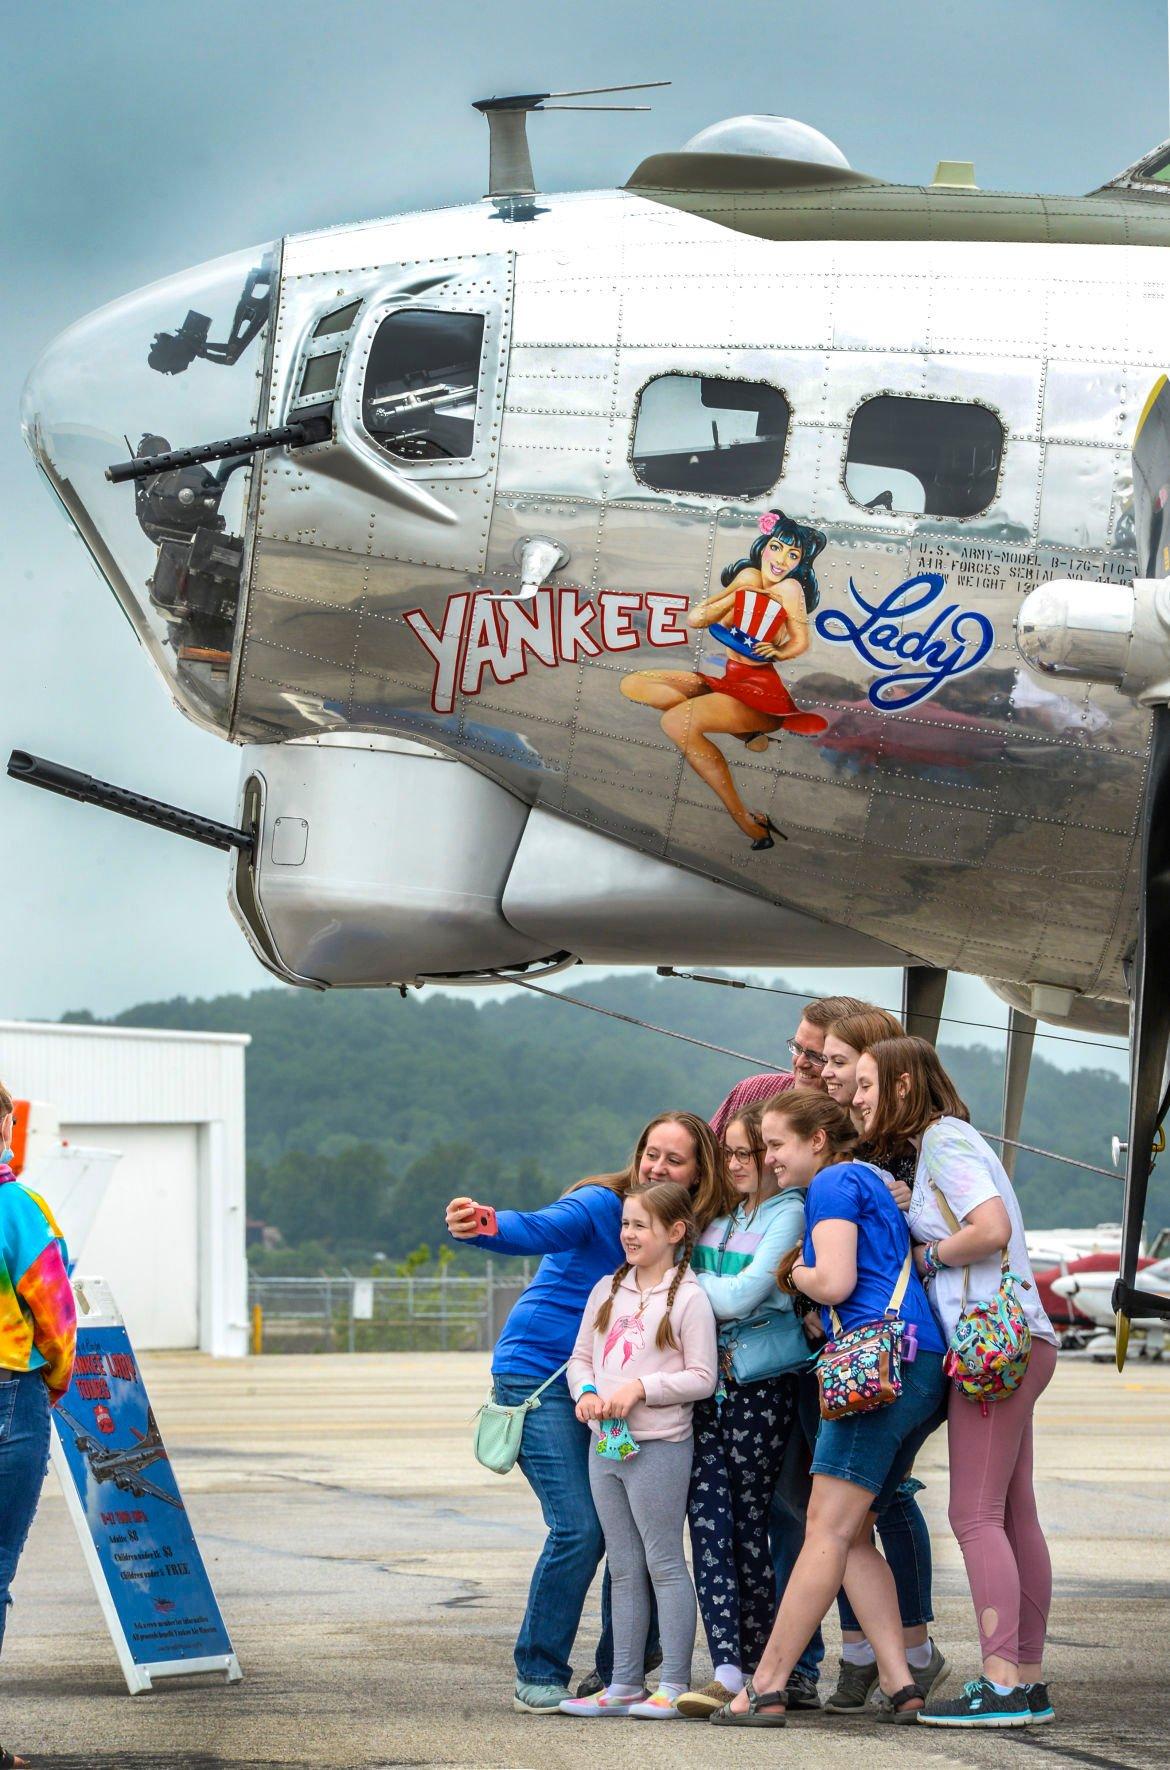 B-17 THE YANKEE LADY